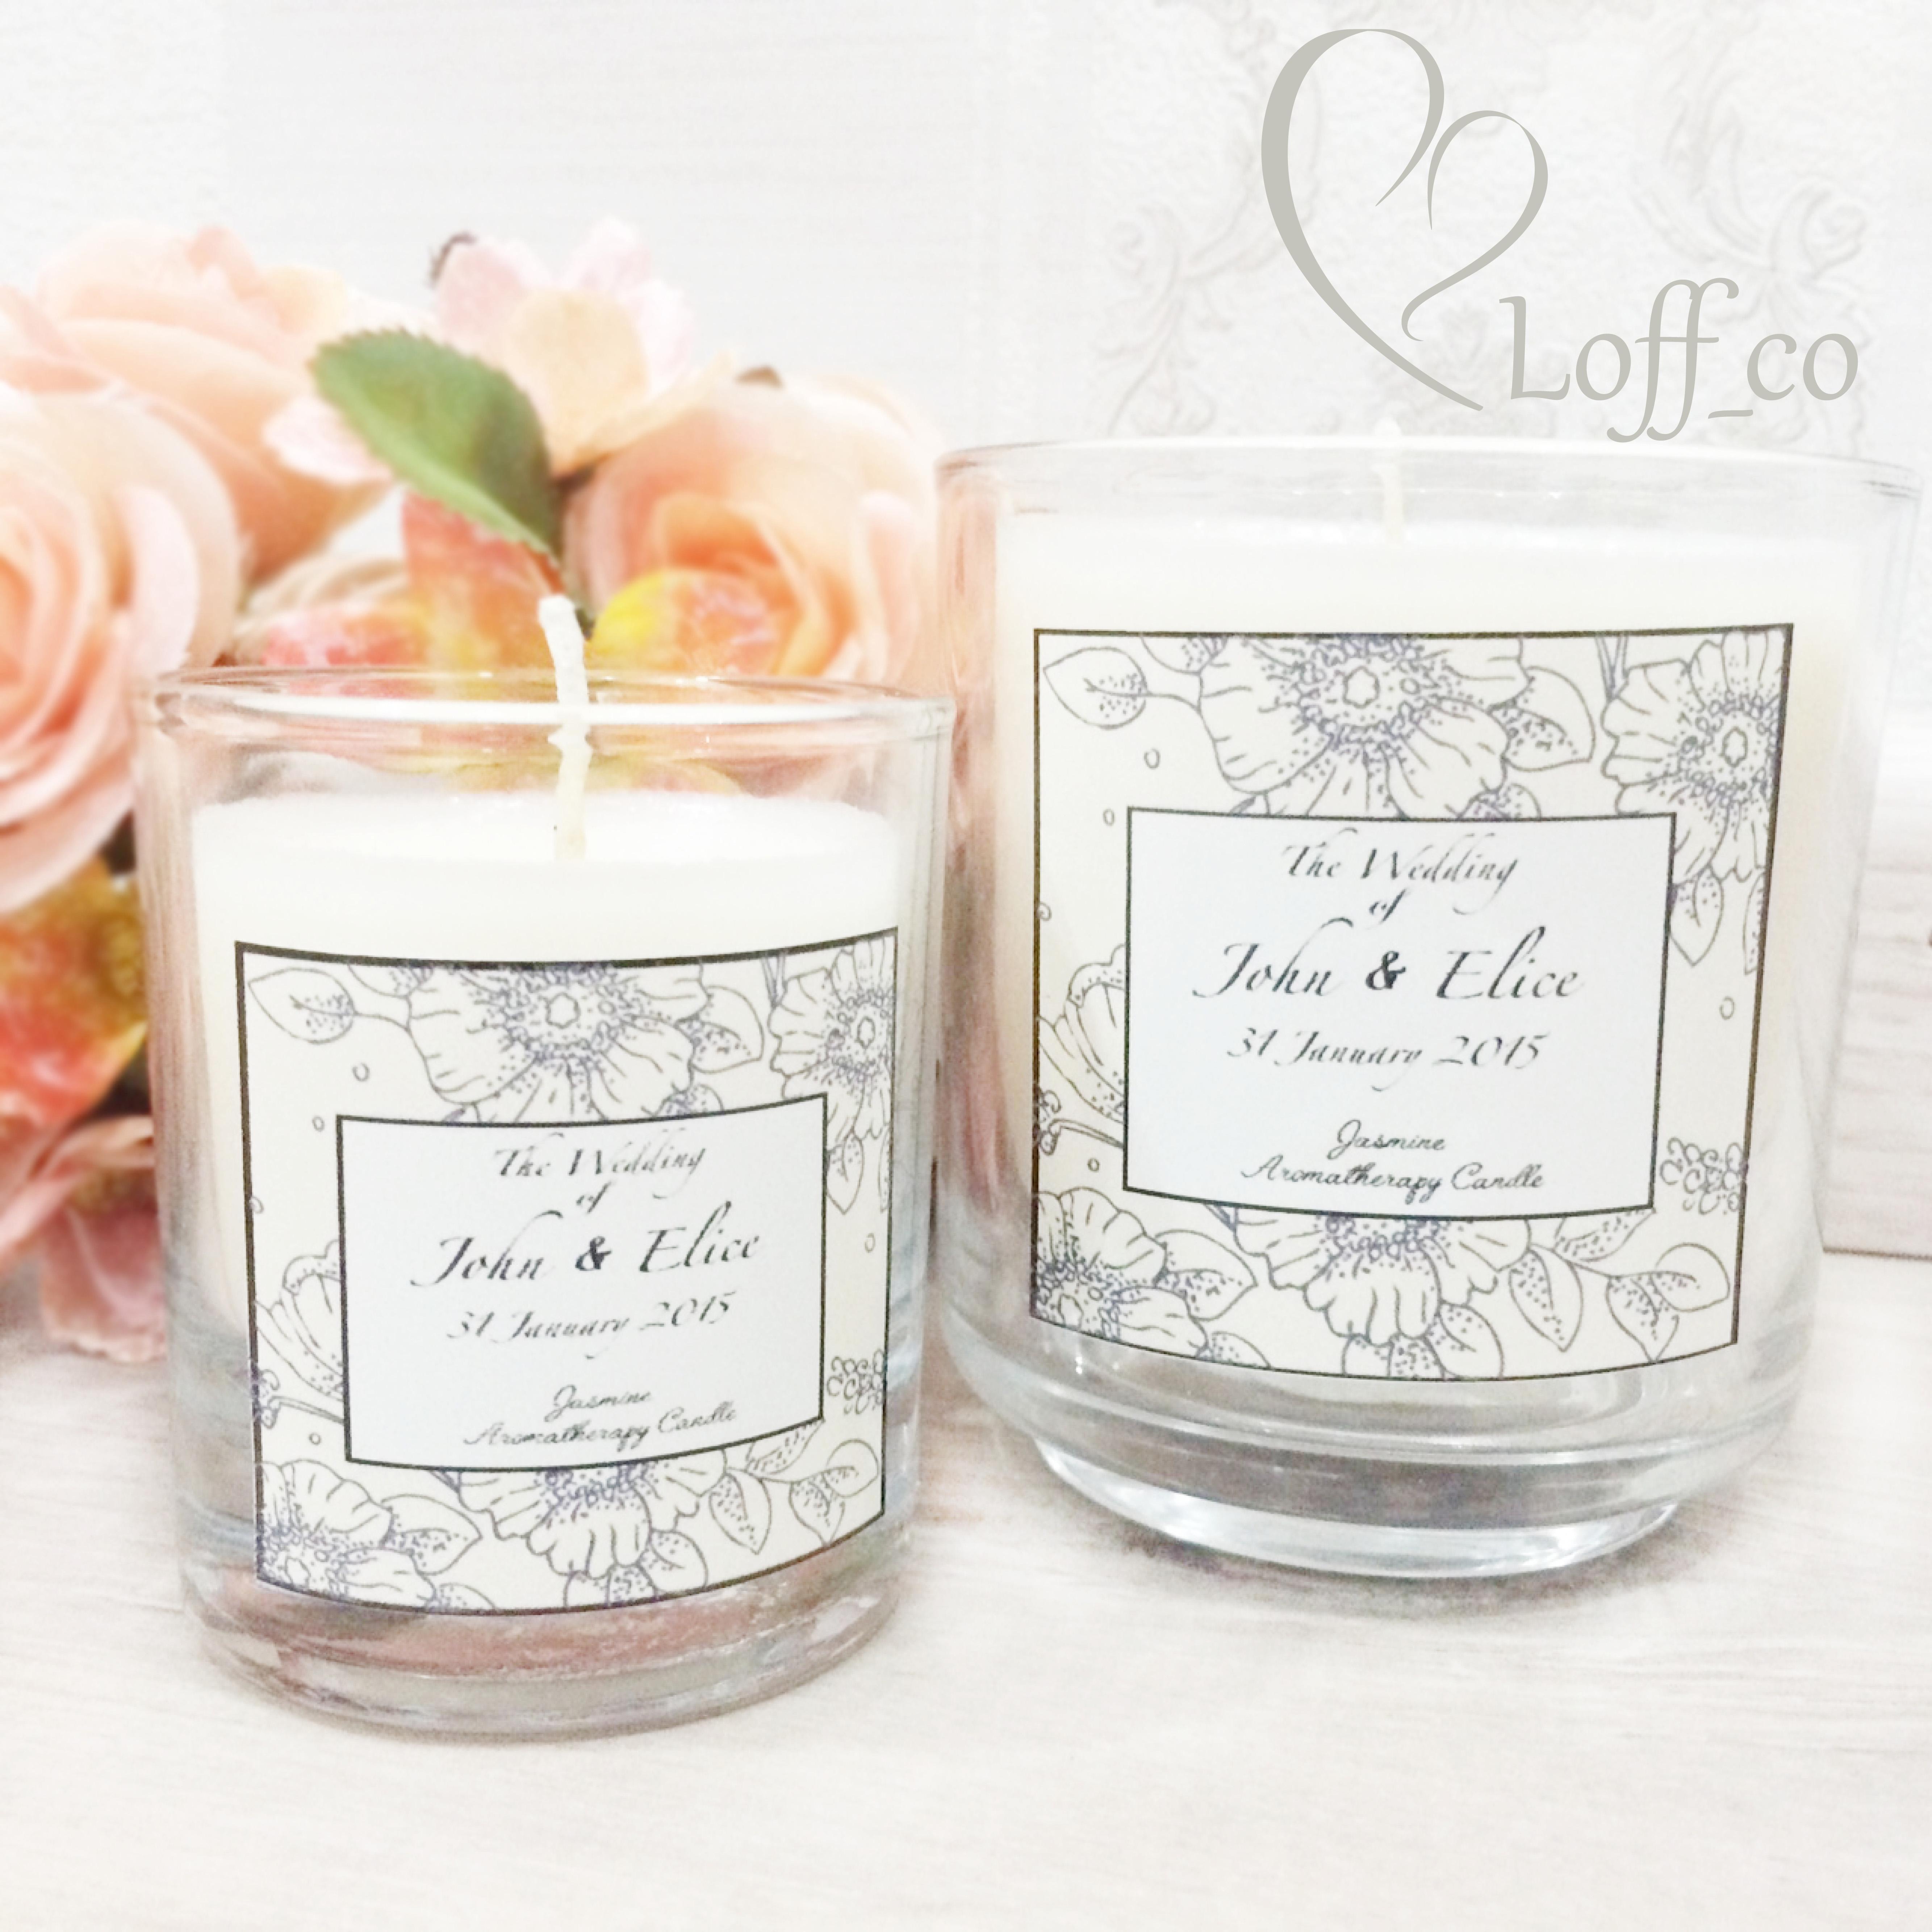 Aromatherapy Candle by Loff_co souvenir | Bridestory.com